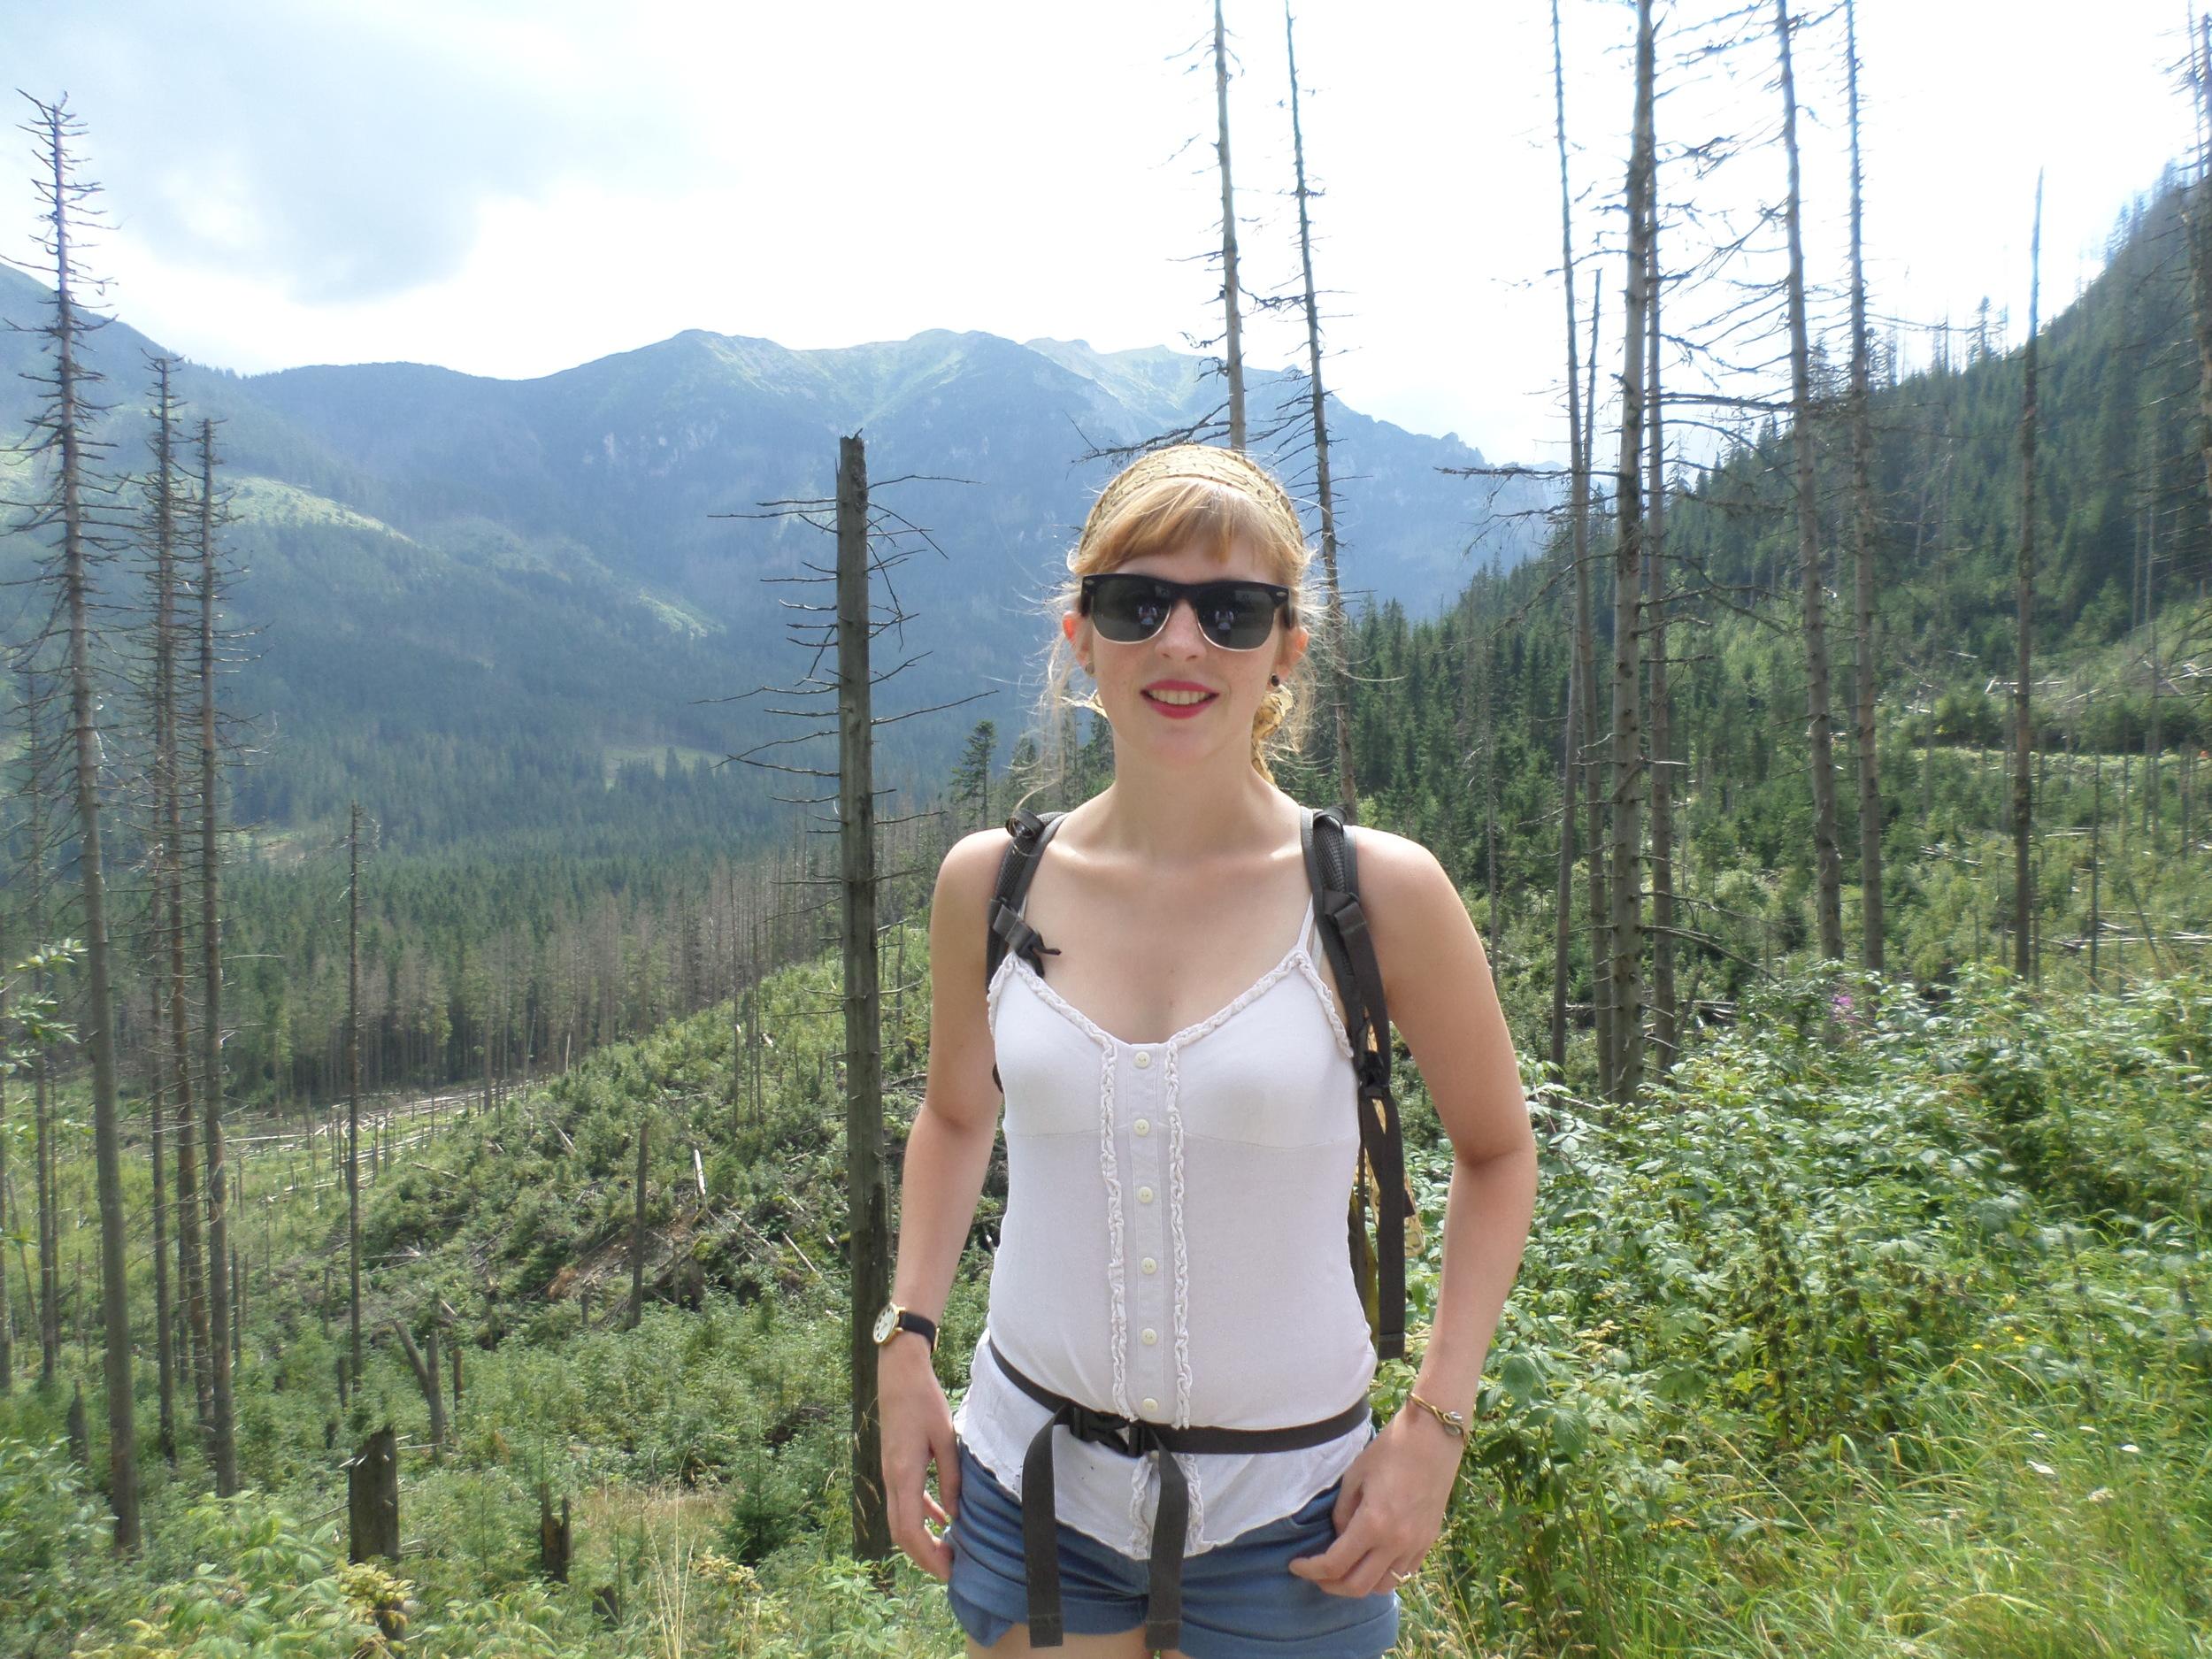 Cynthia hiking in Zakopane, Poland